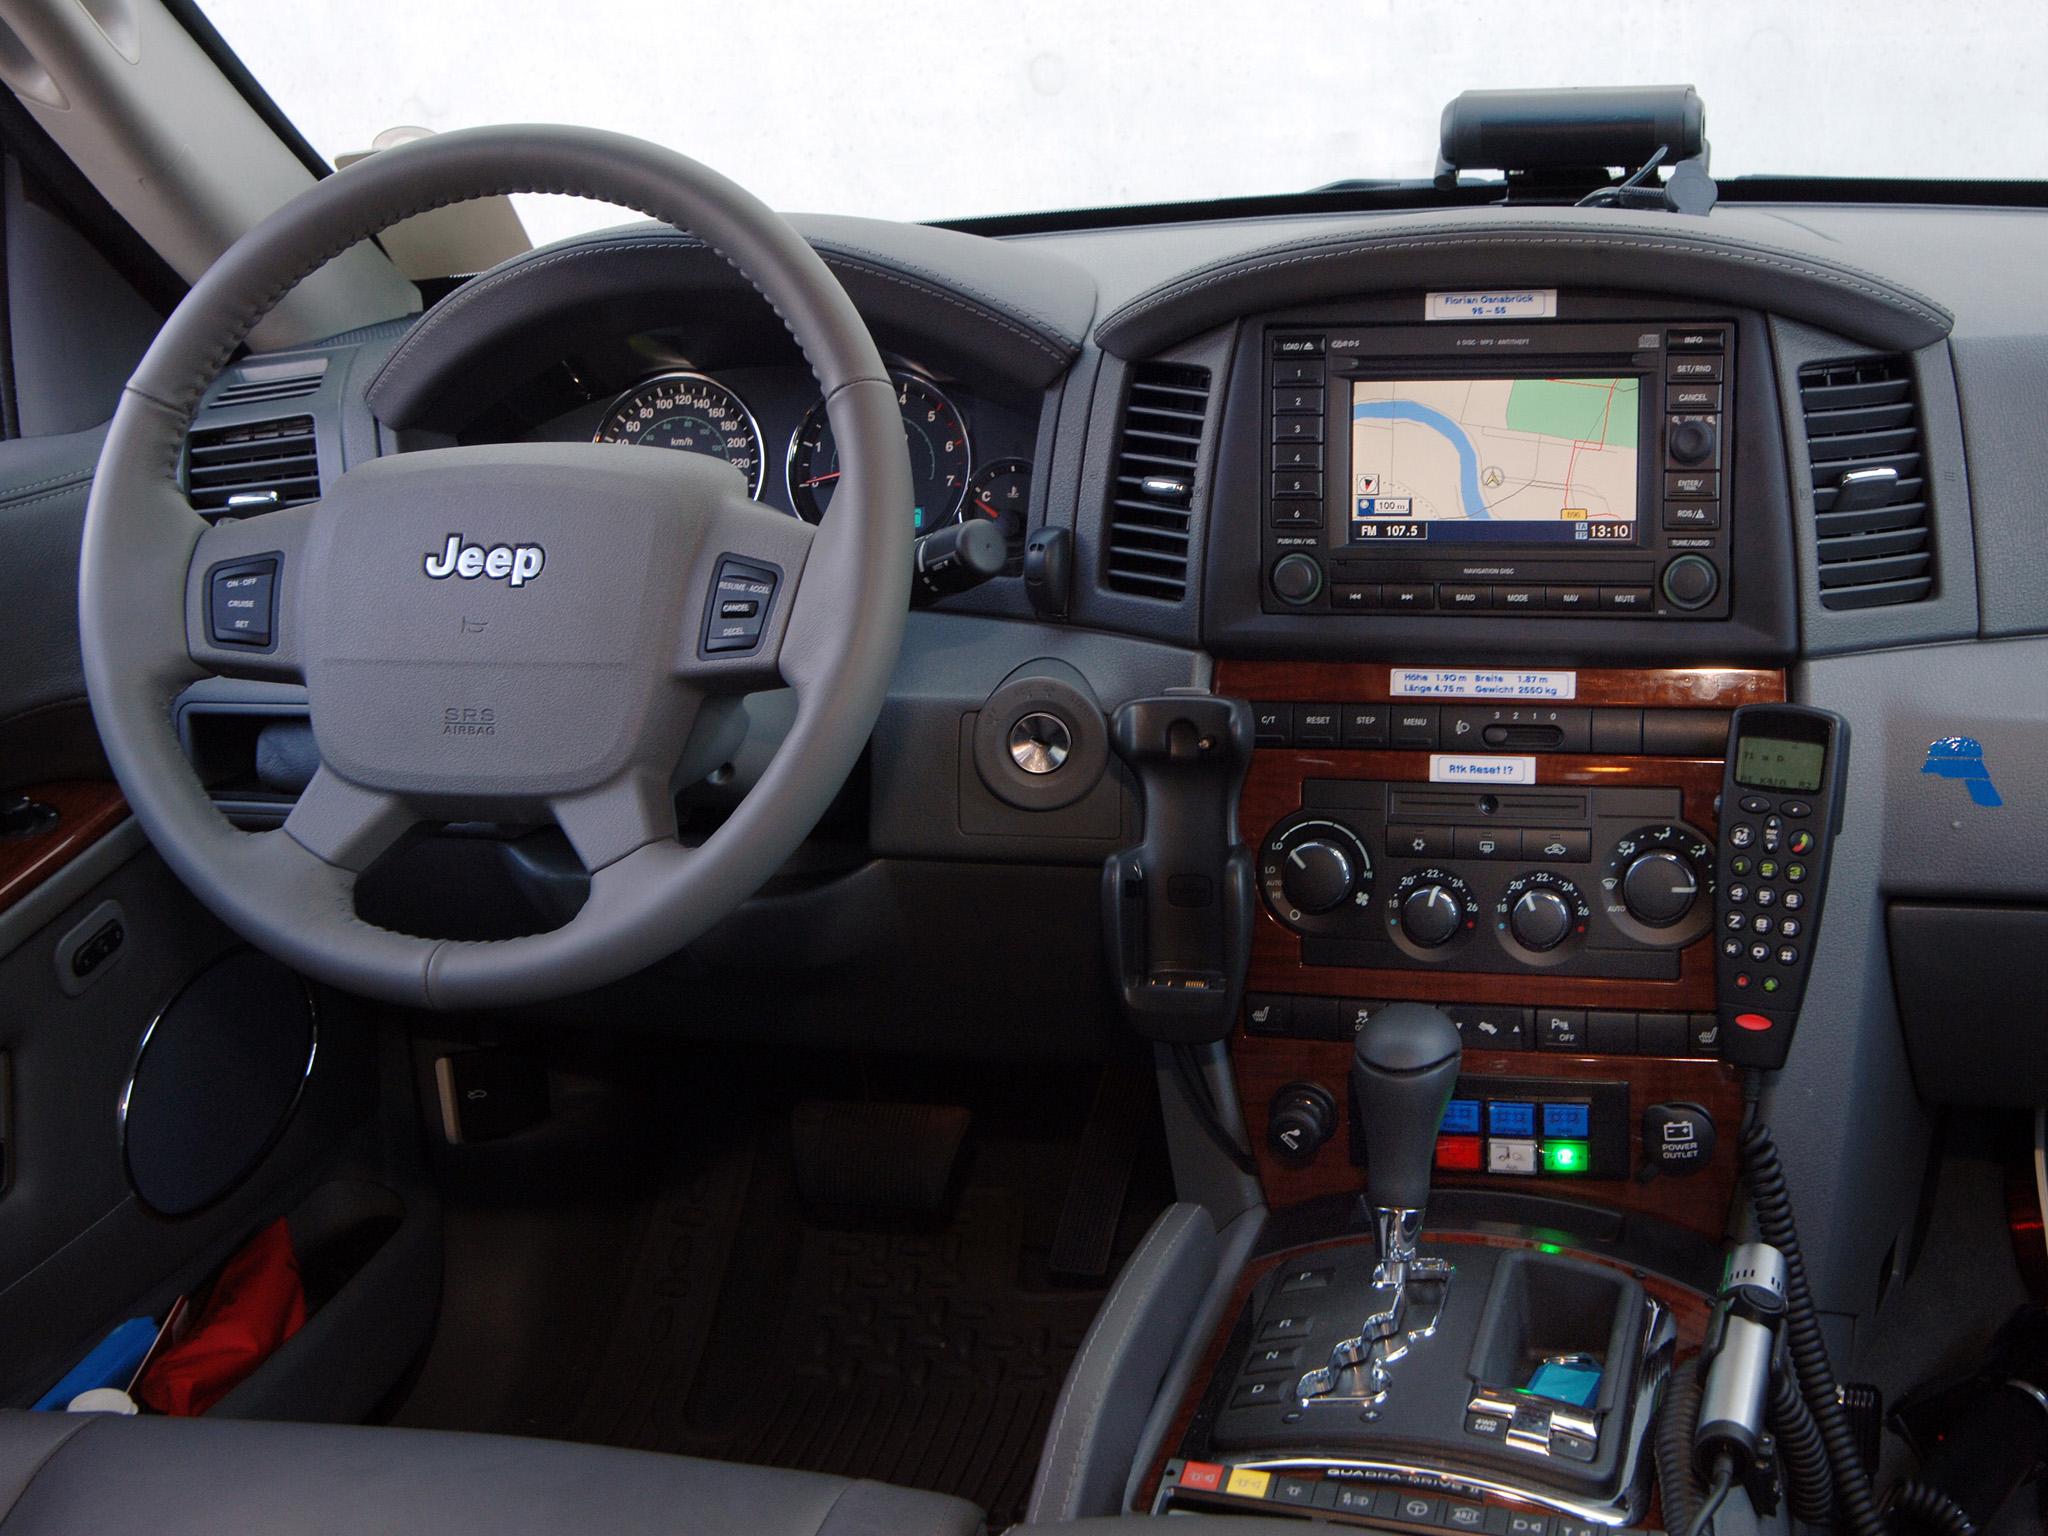 2005 jeep grand cherokee notarzt wk emergency ambulance firetruck interior g wallpaper. Black Bedroom Furniture Sets. Home Design Ideas